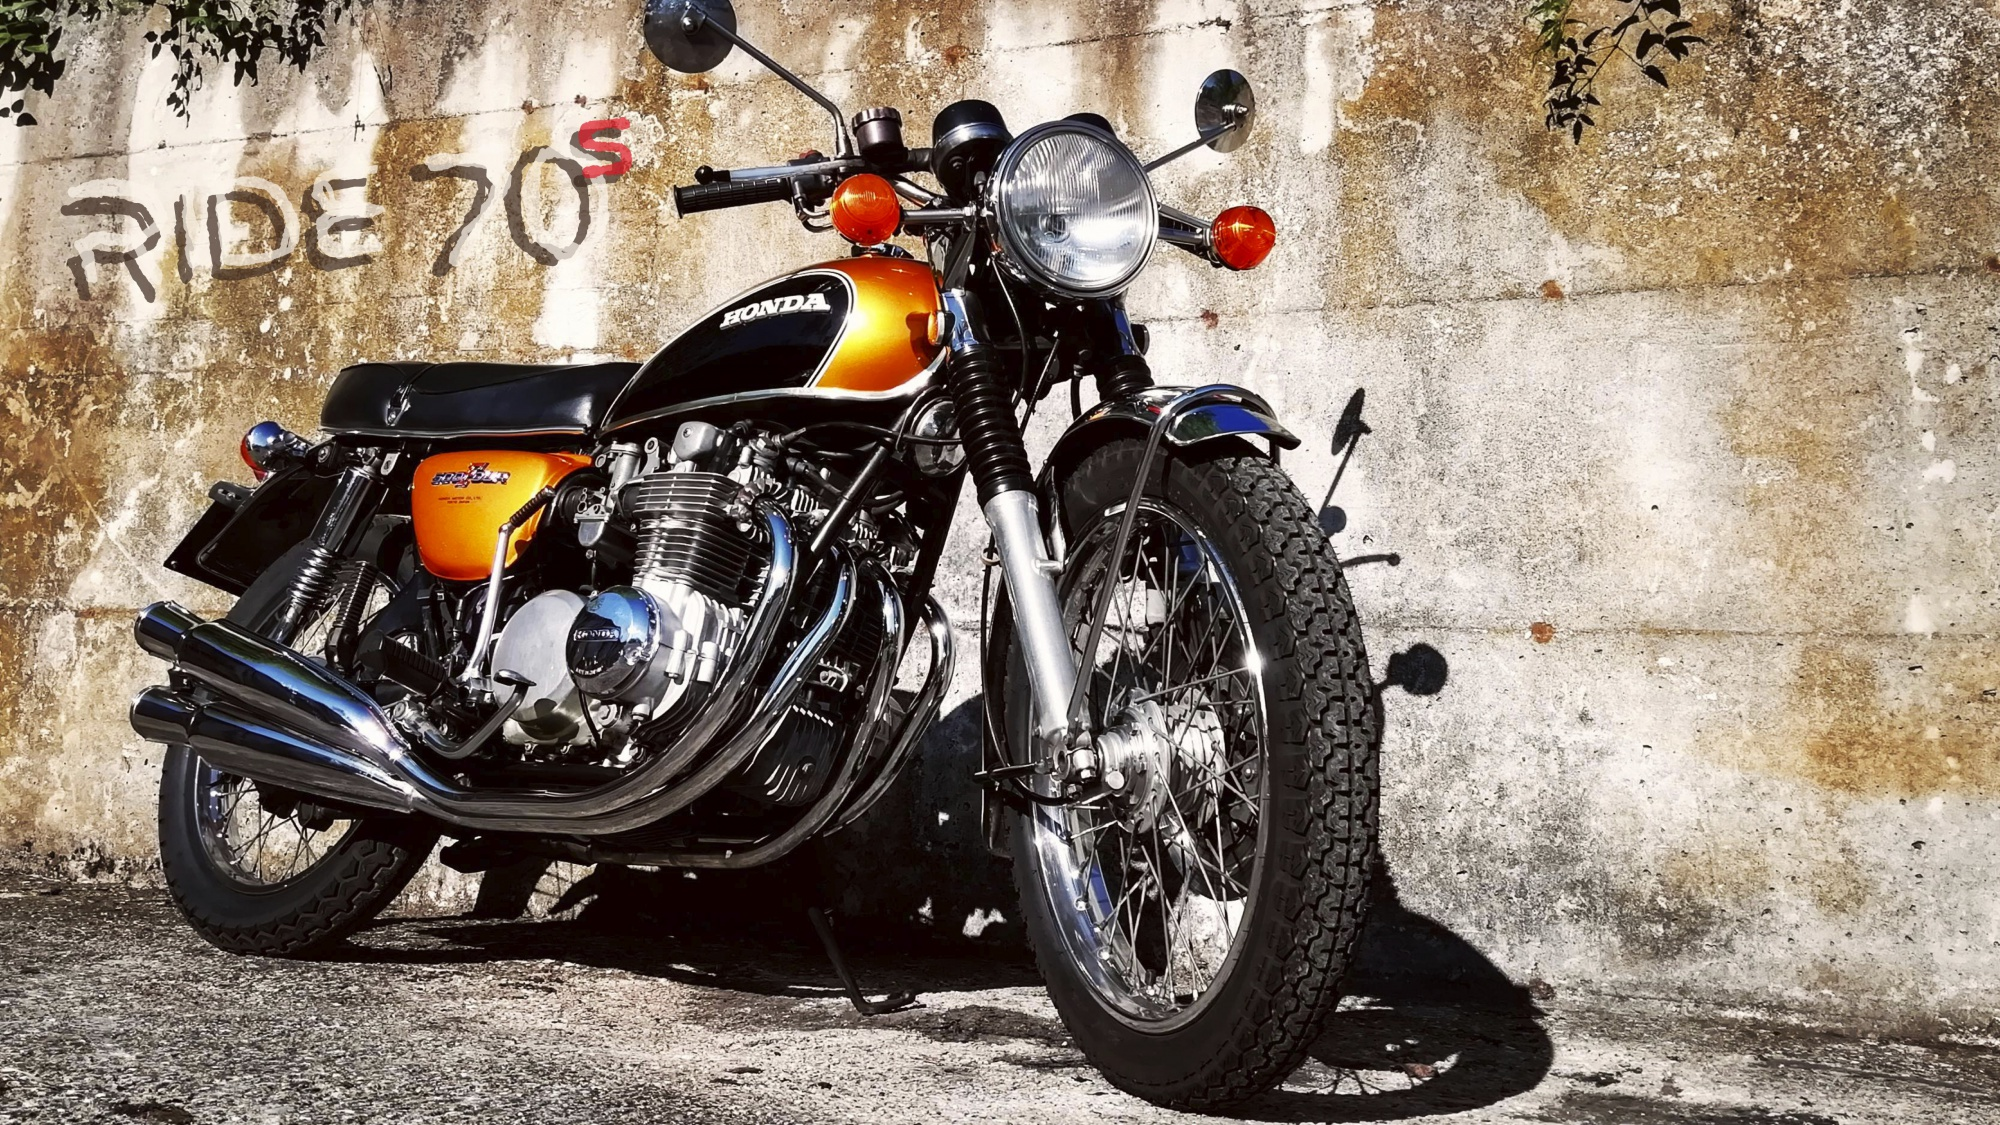 ride70s en 1971-honda-cb-500-four 001